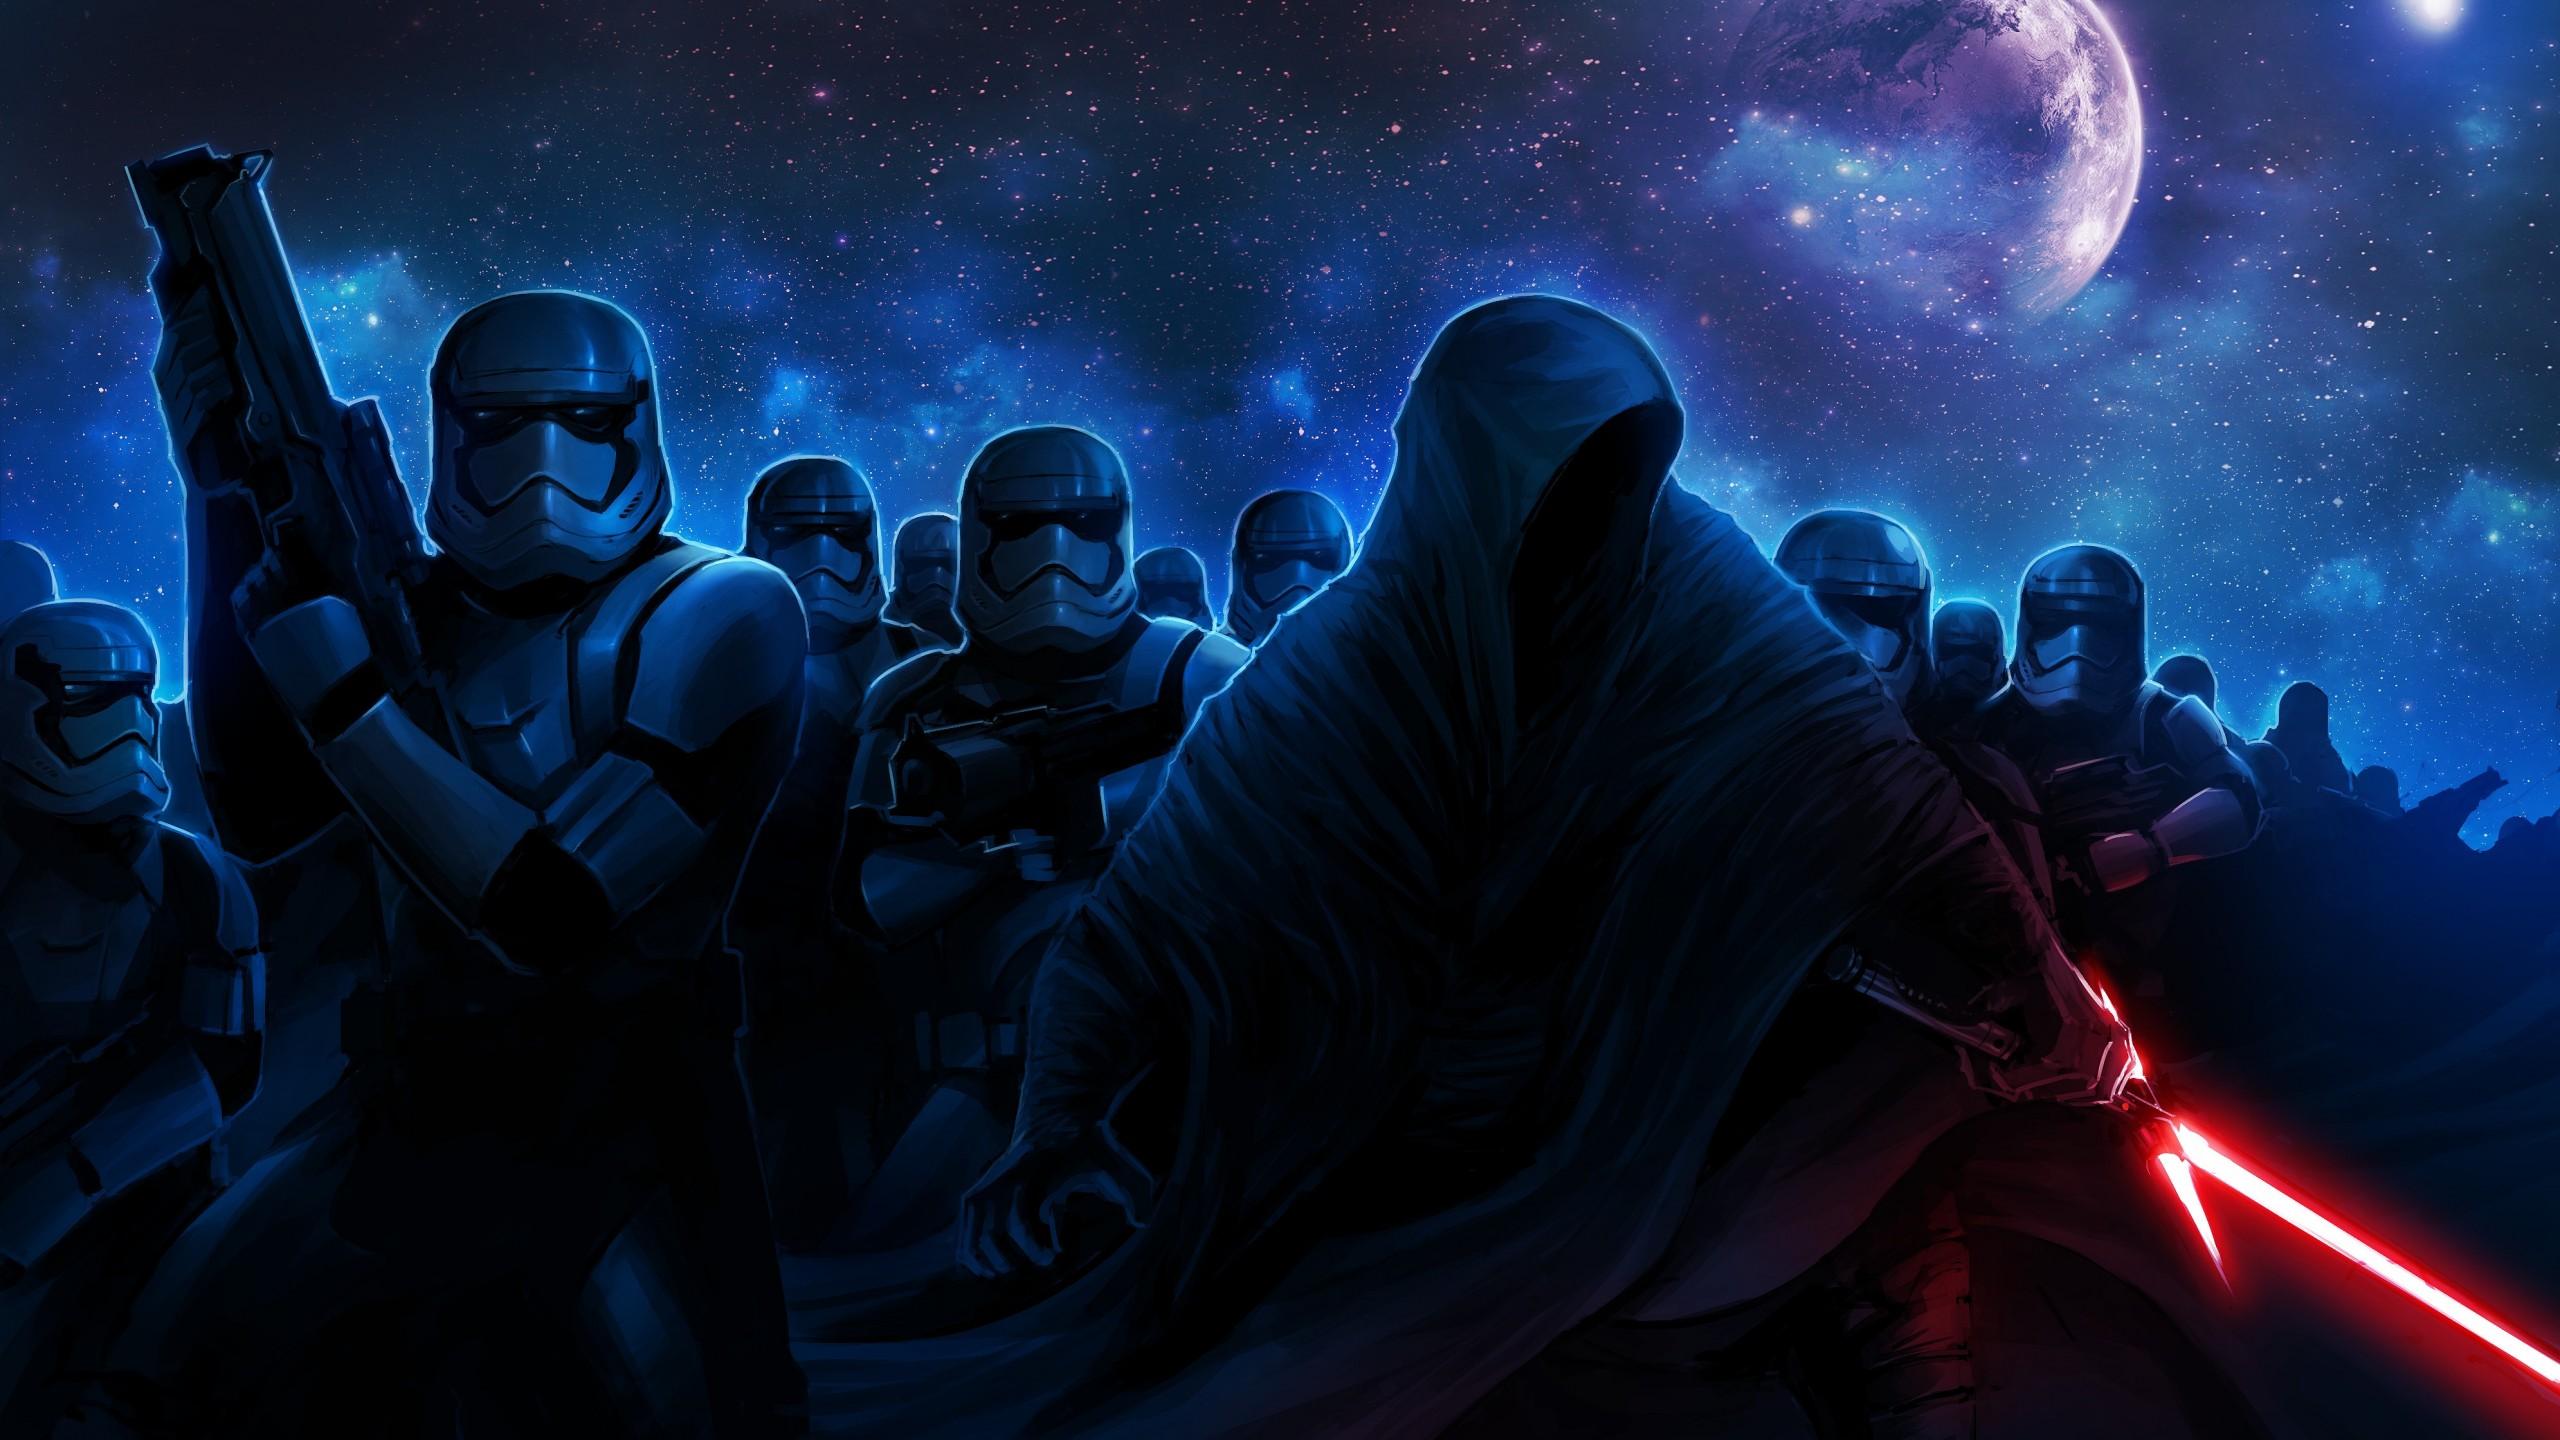 Force Awakens, Star Wars 7, movie, film